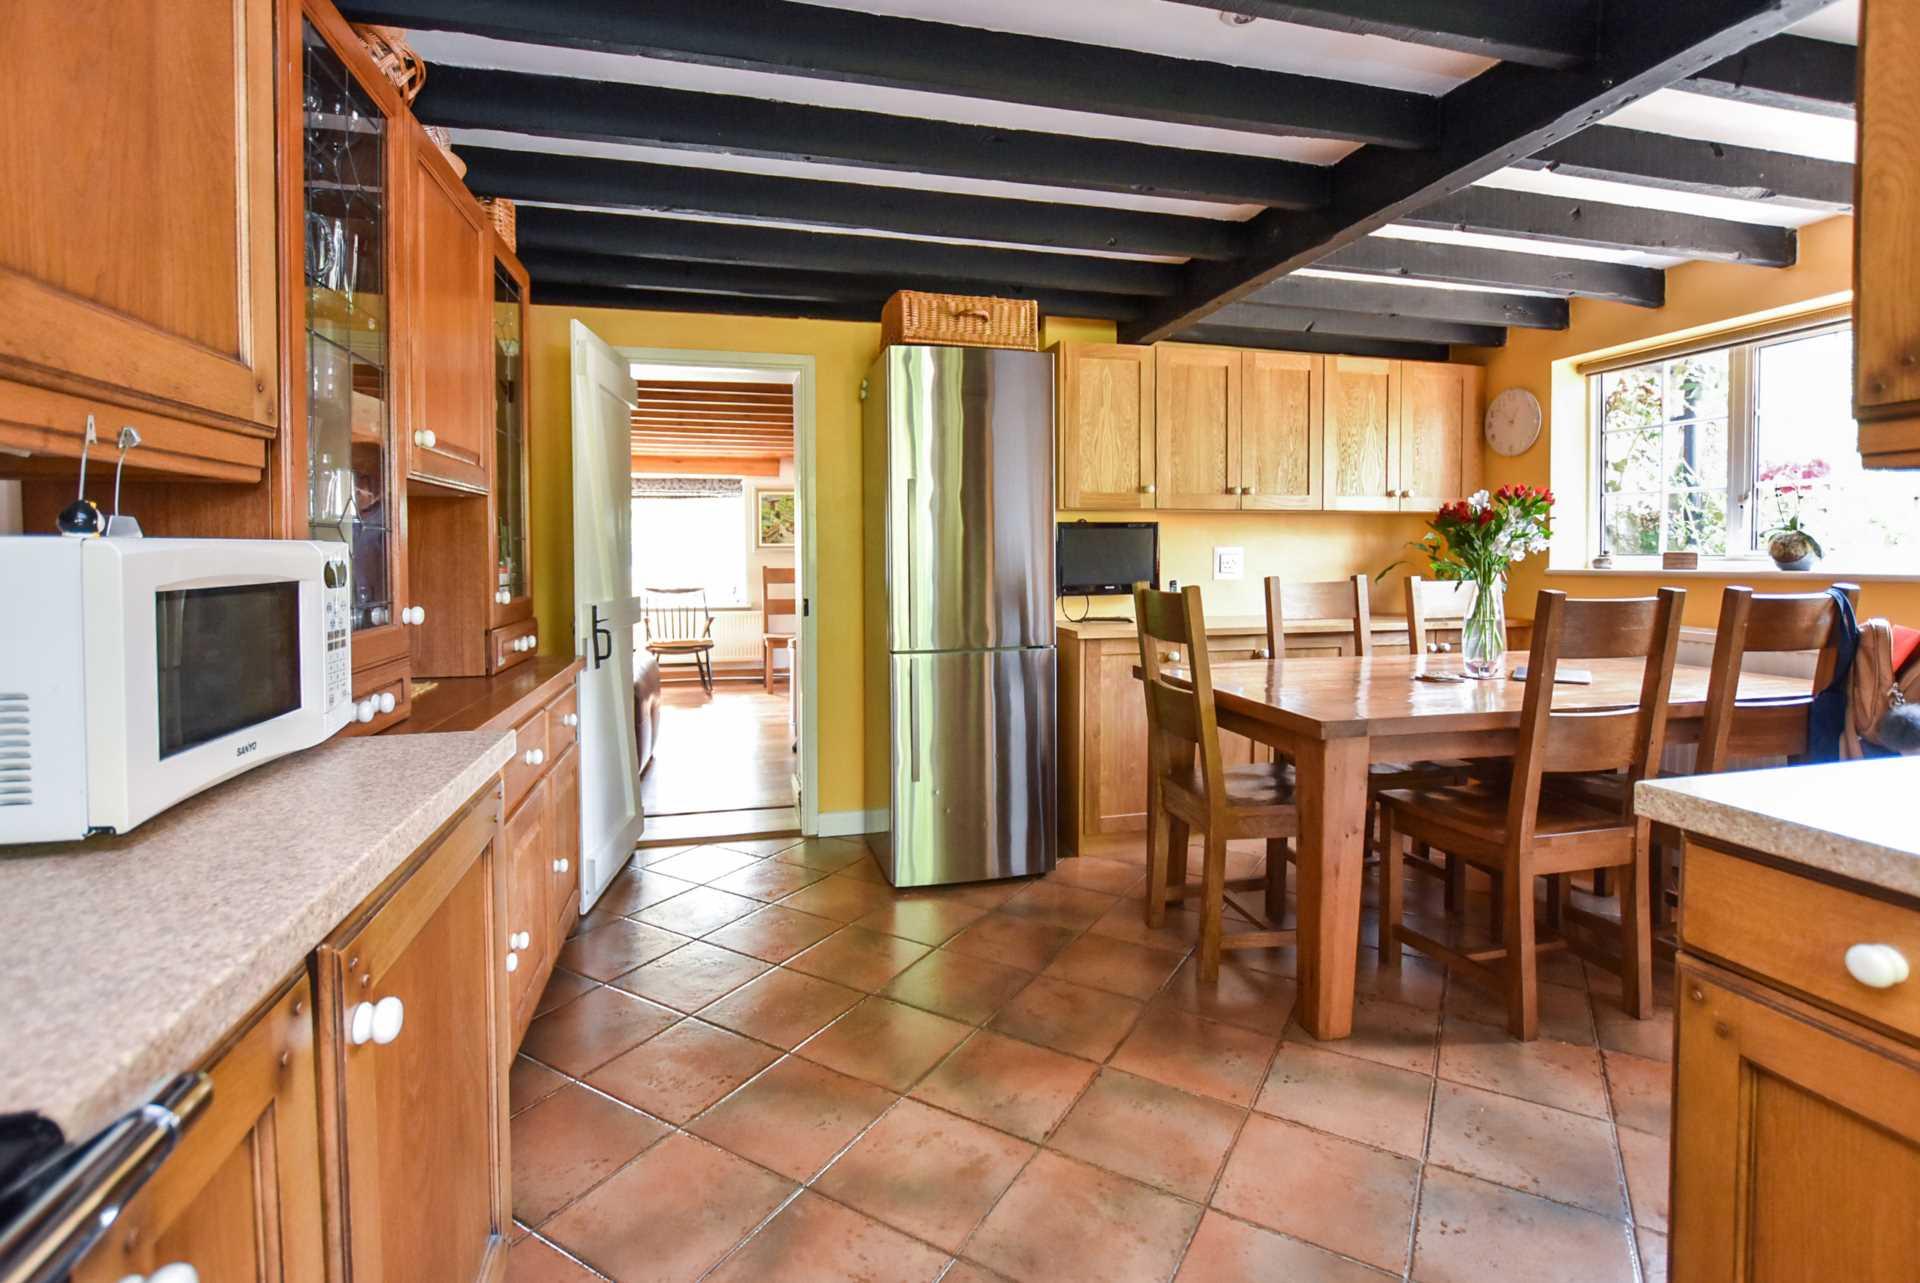 Fullamoor Cottages, Clifton Hampden, Image 4